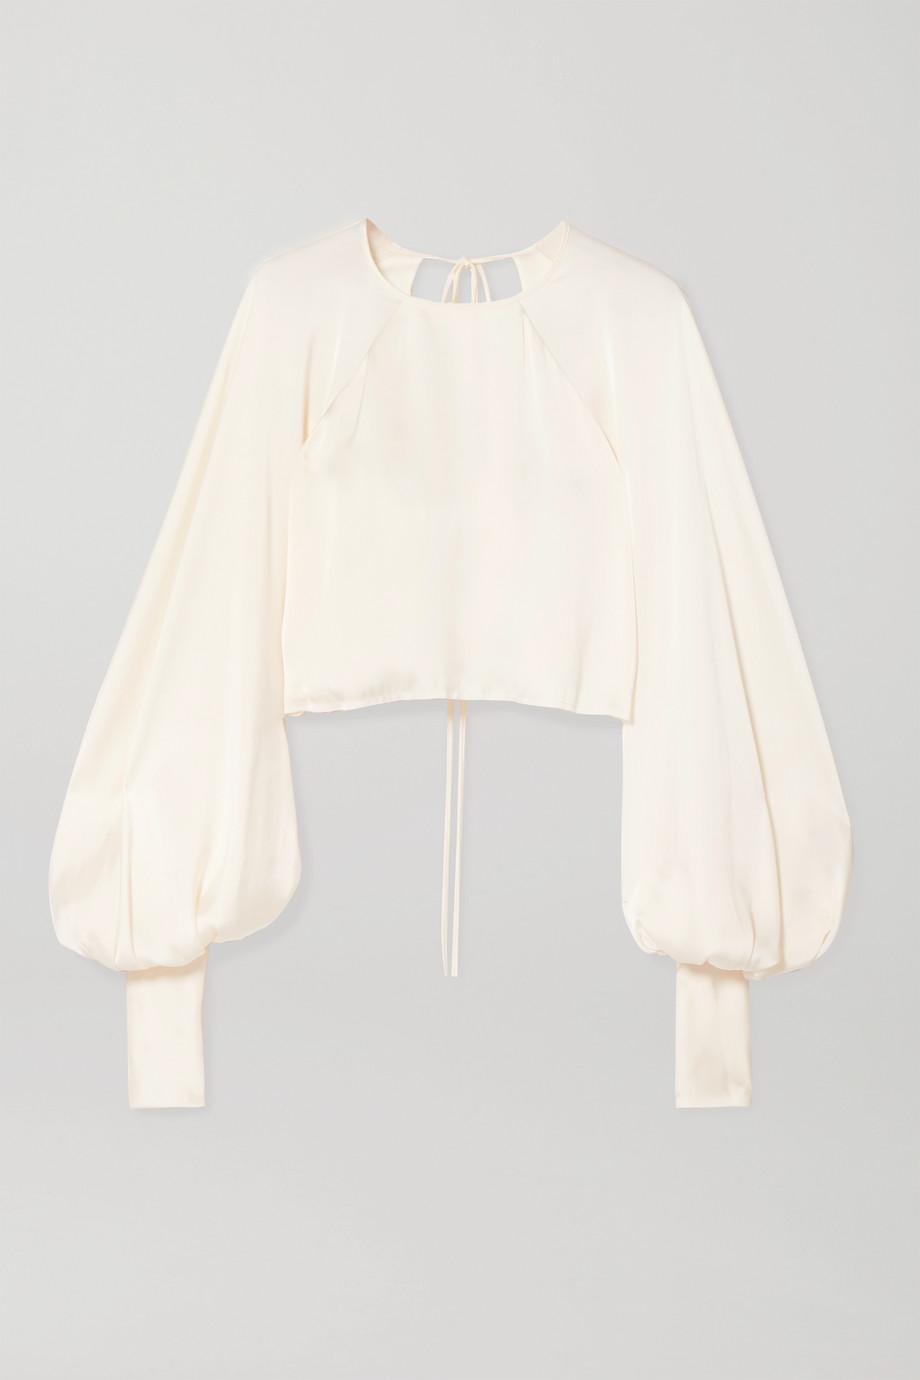 Orseund Iris Drama cropped satin blouse